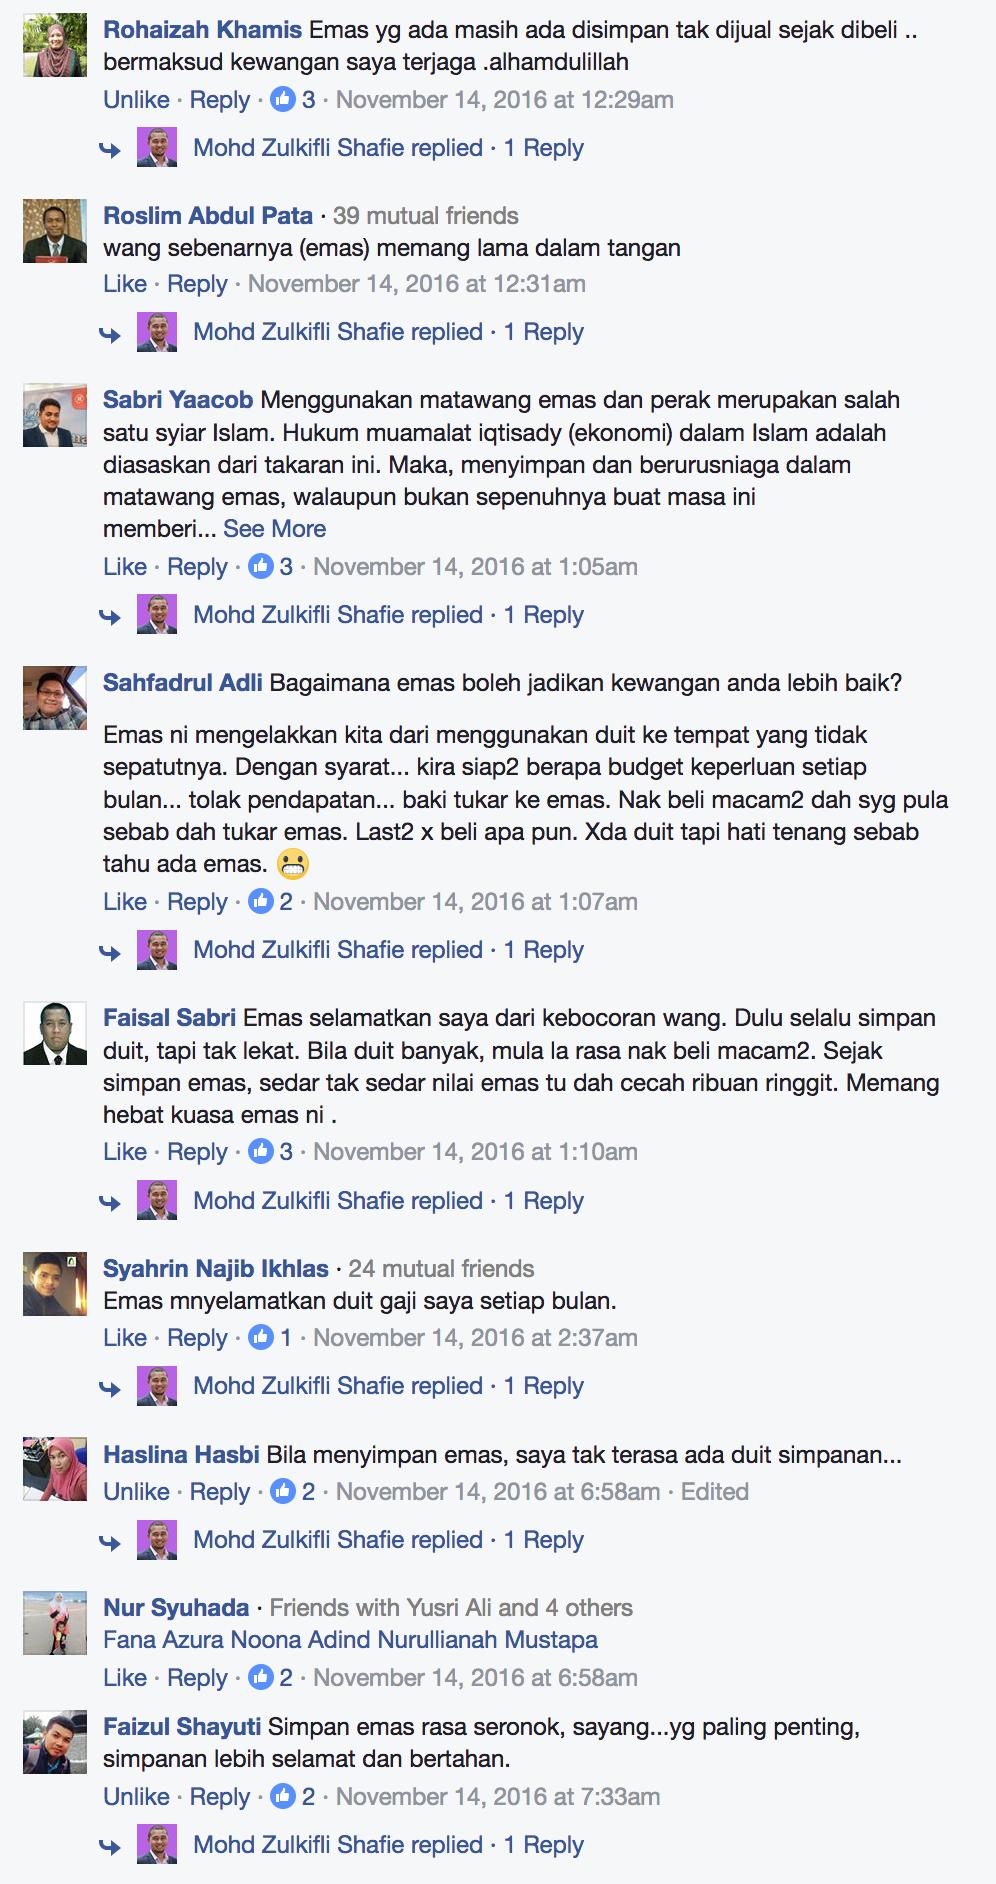 FB Screen Shot testimoni penyimpan emas 3